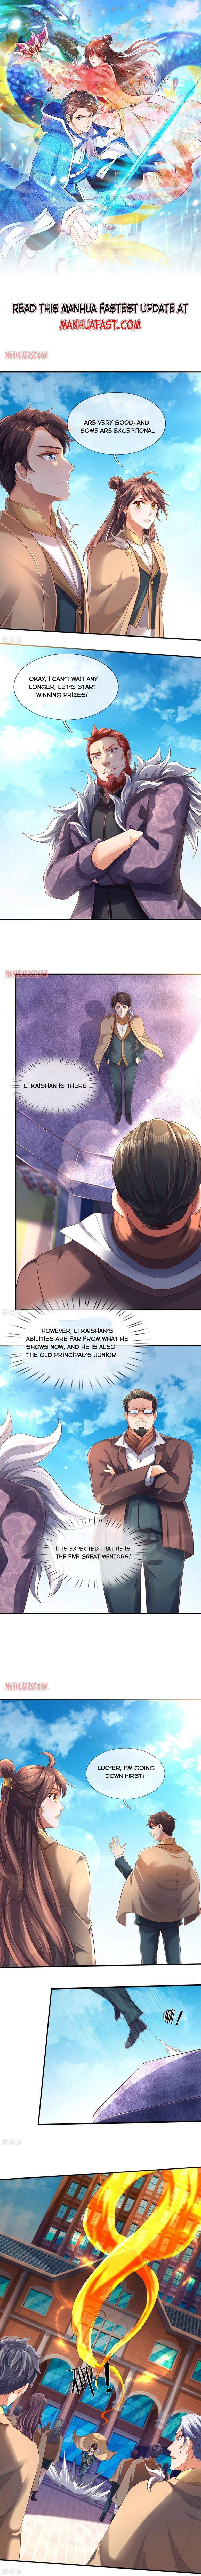 https://manga.mangadogs.com/comics/pic4/39/32615/2895027/5bf8aaef51c6e0d363cbe554acaf3f20.jpg Page 1